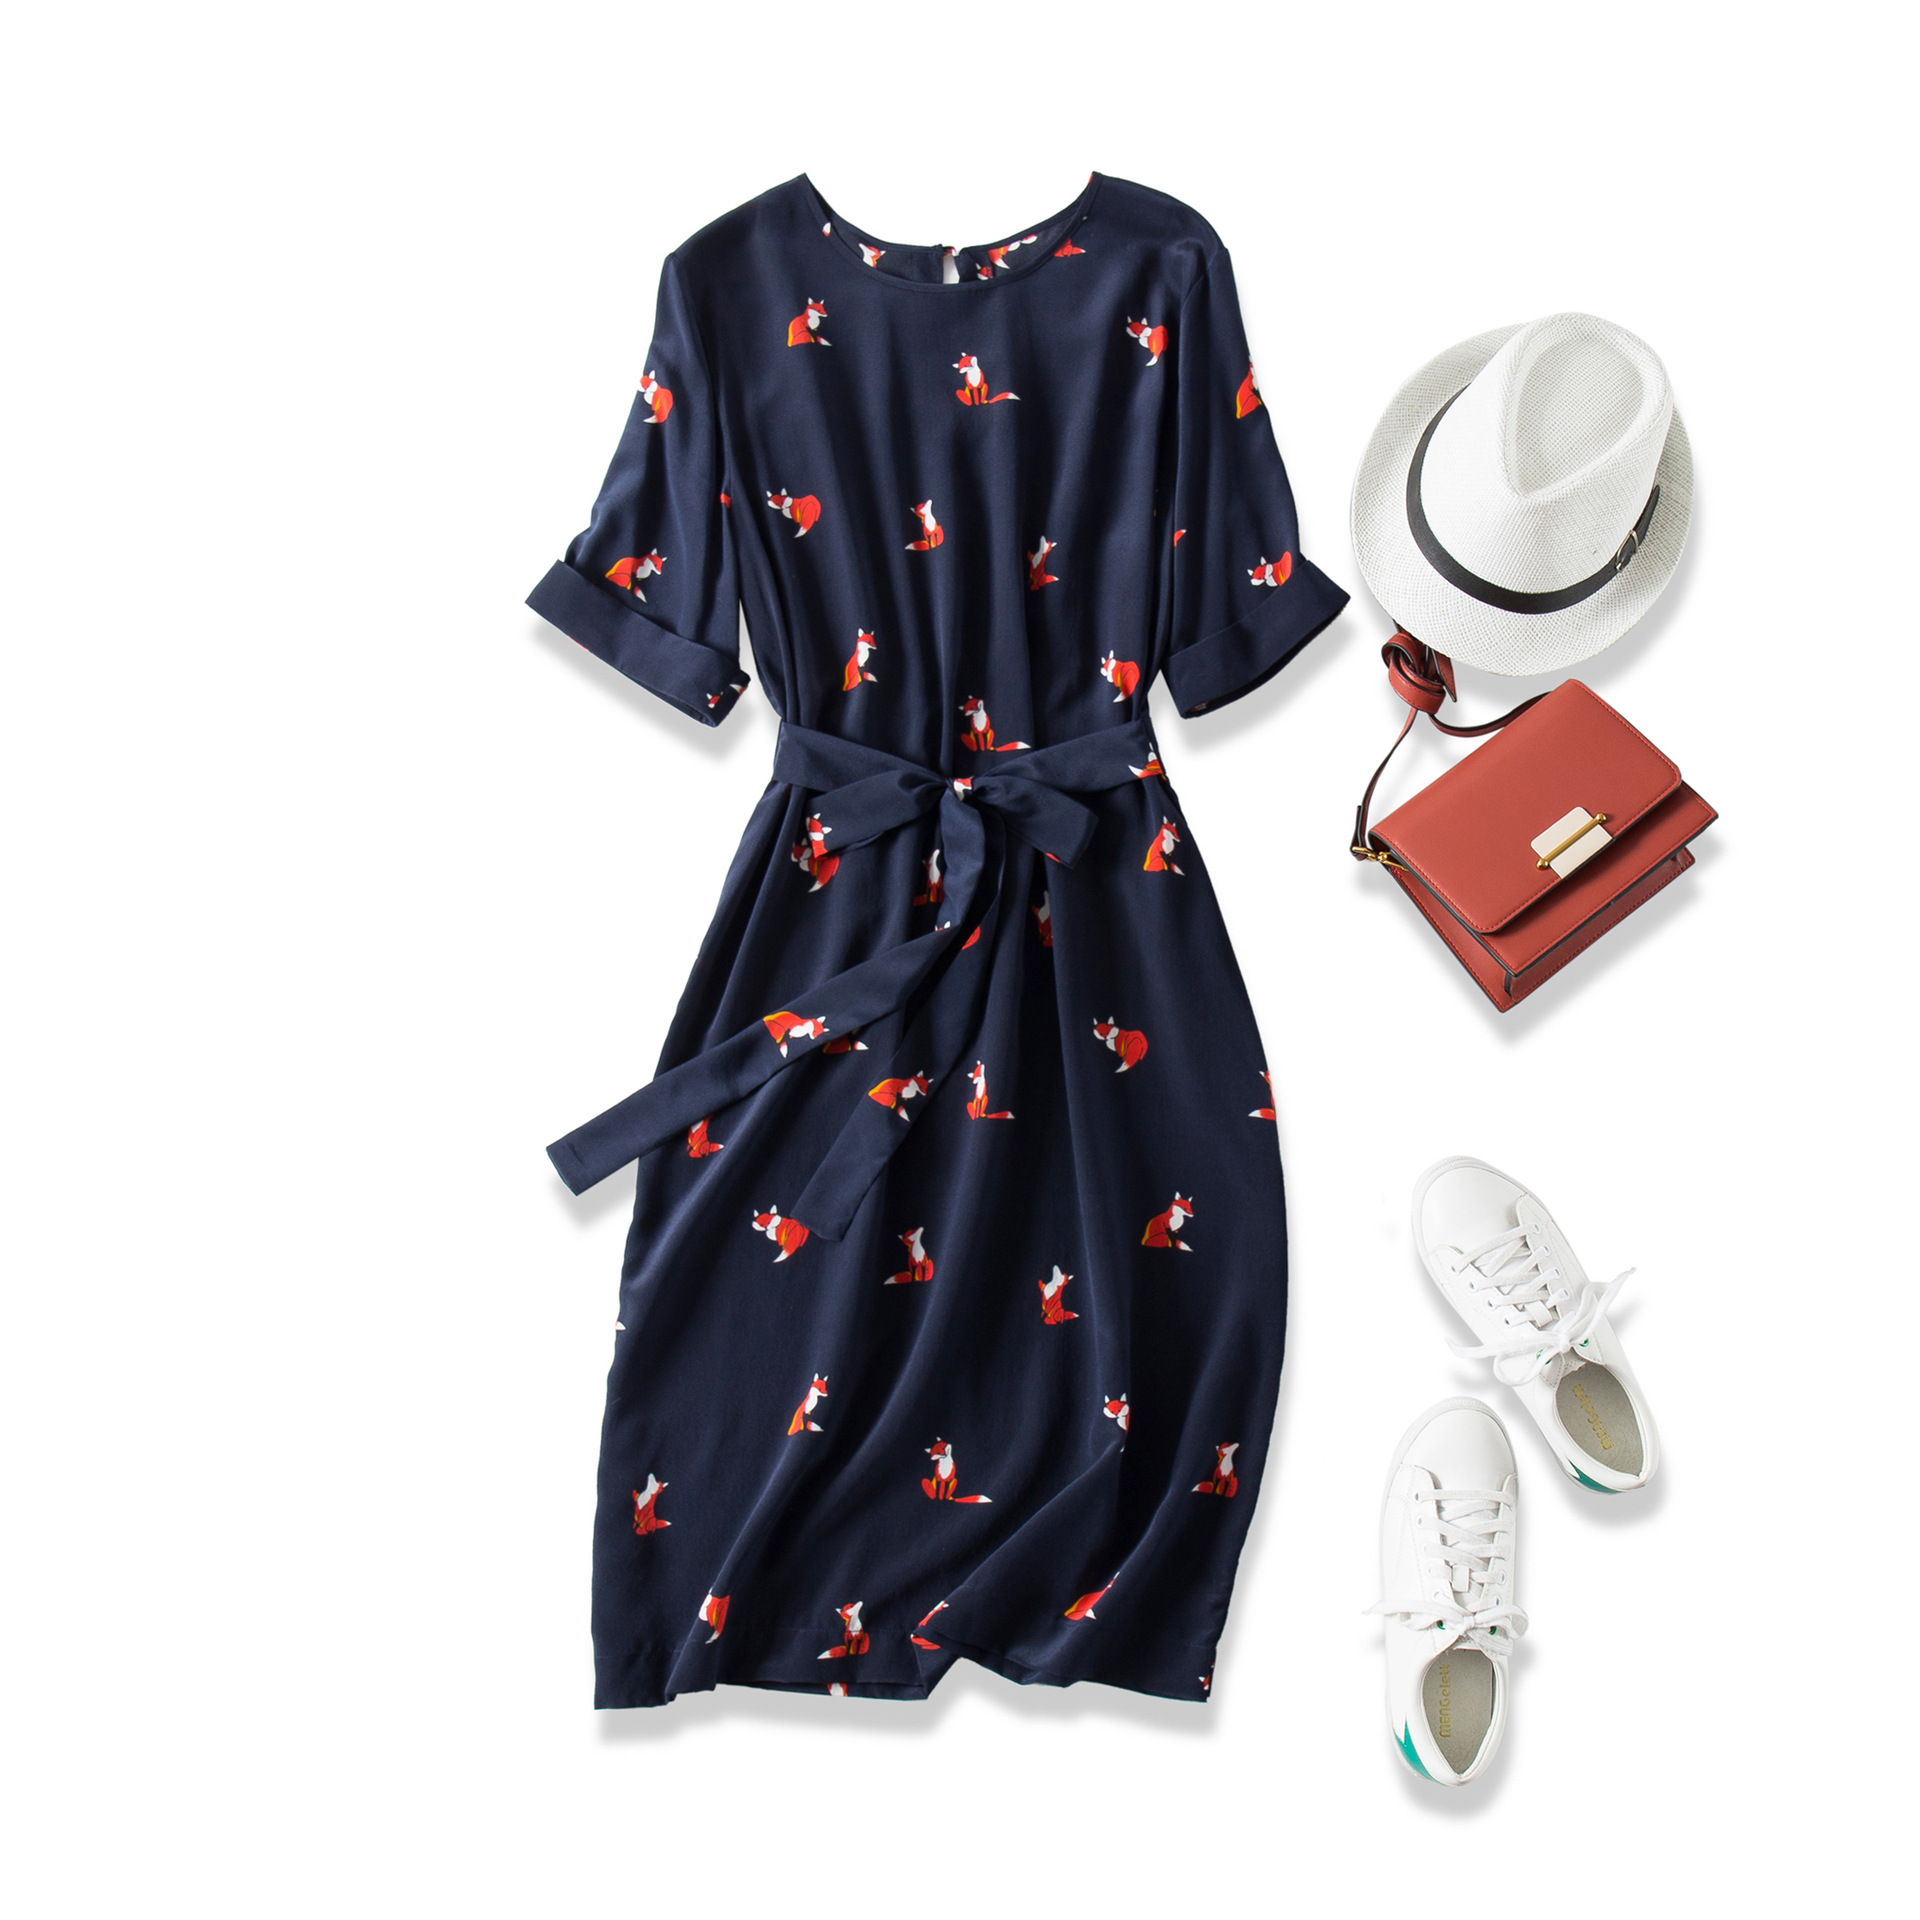 19 Summer New Skin White And Beautiful! Cute Fox Print Lace up Waist Long Mulberry Silk Dress